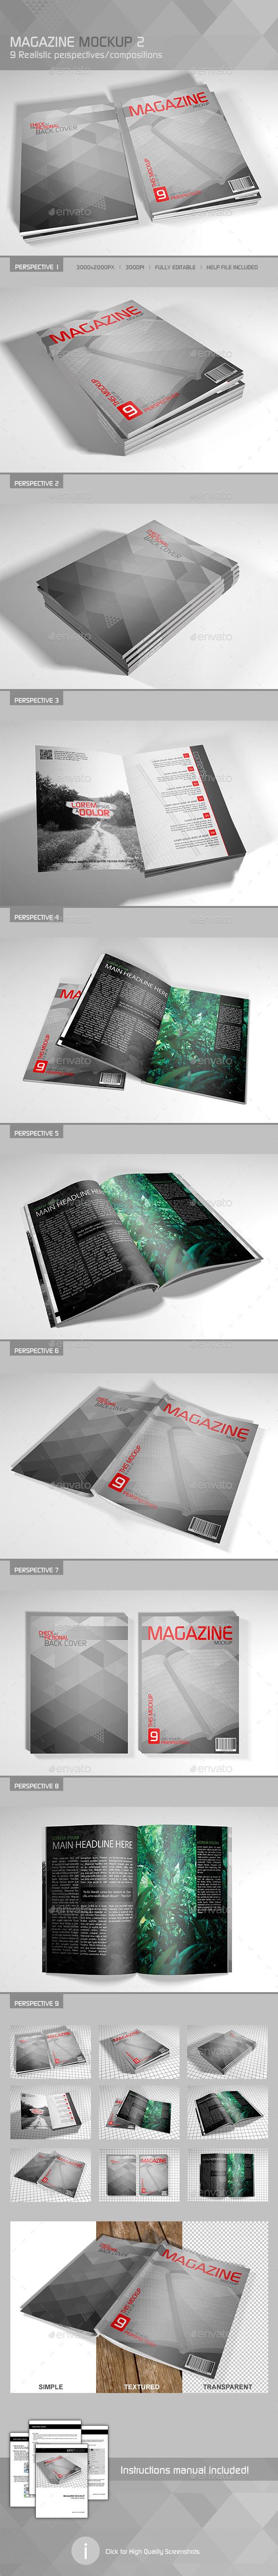 Realistic Magazine Mockup 2 - Magazines Print